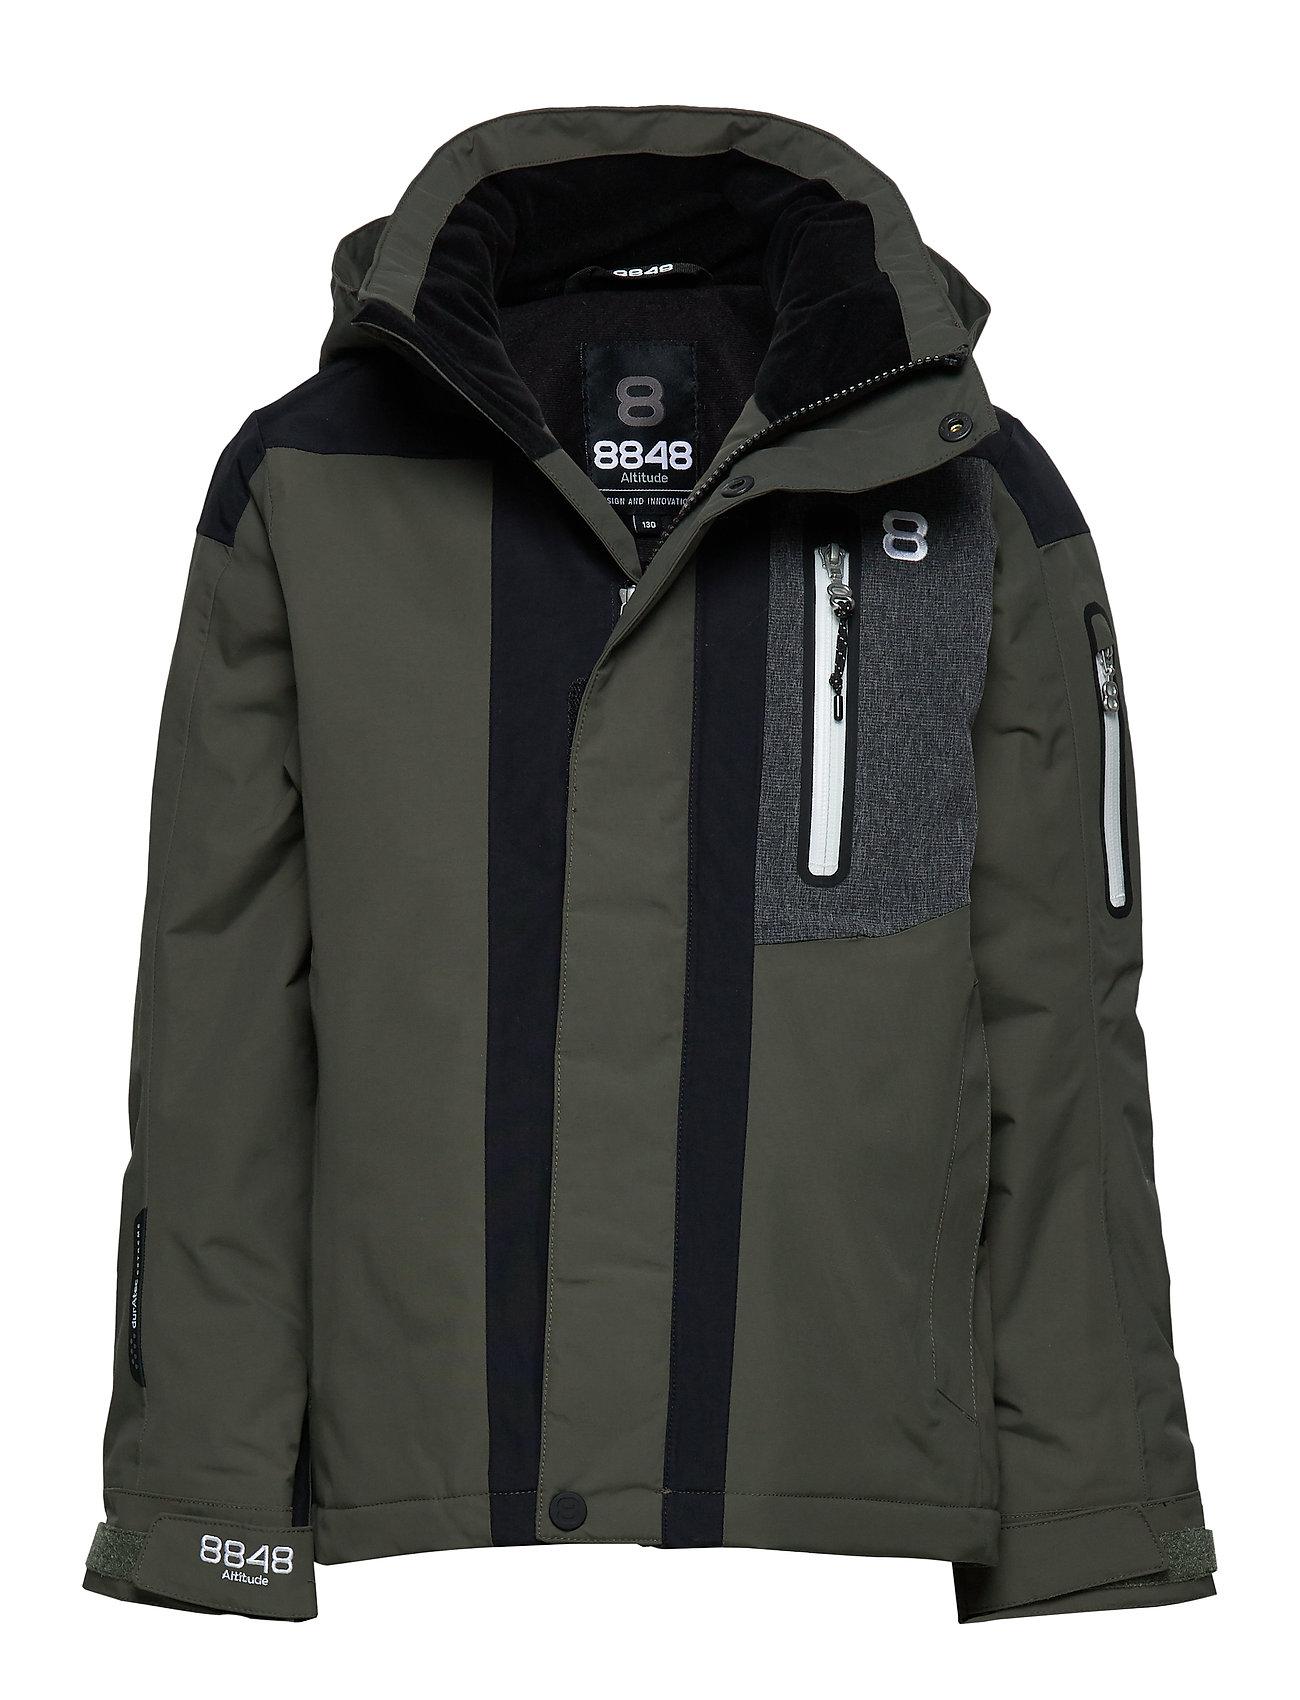 8848 Altitude Aragon JR Jacket - TURTLE